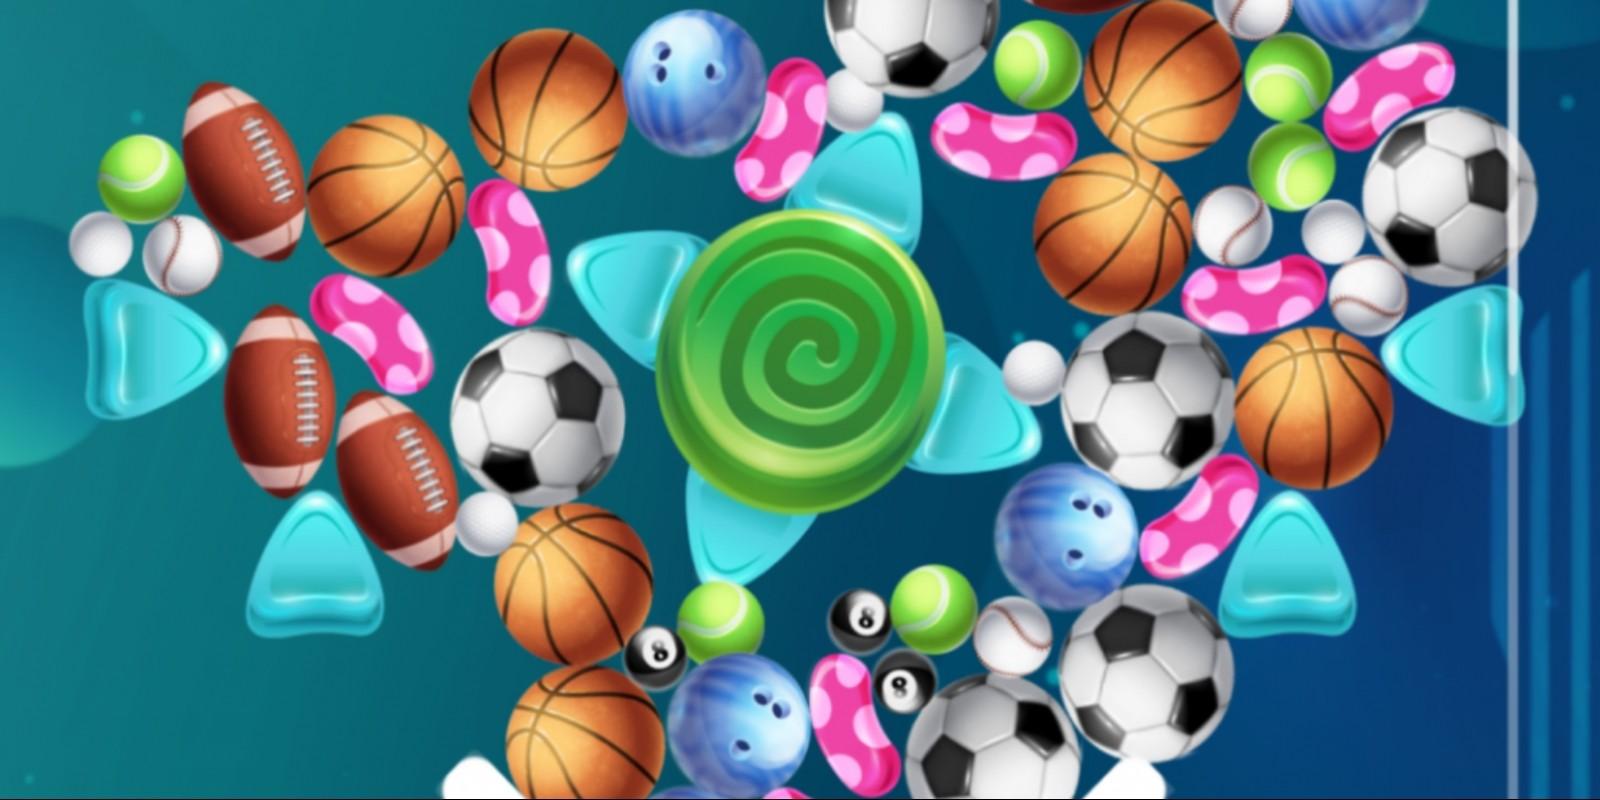 Idle Fall Balls - Idle Casual Game Unity